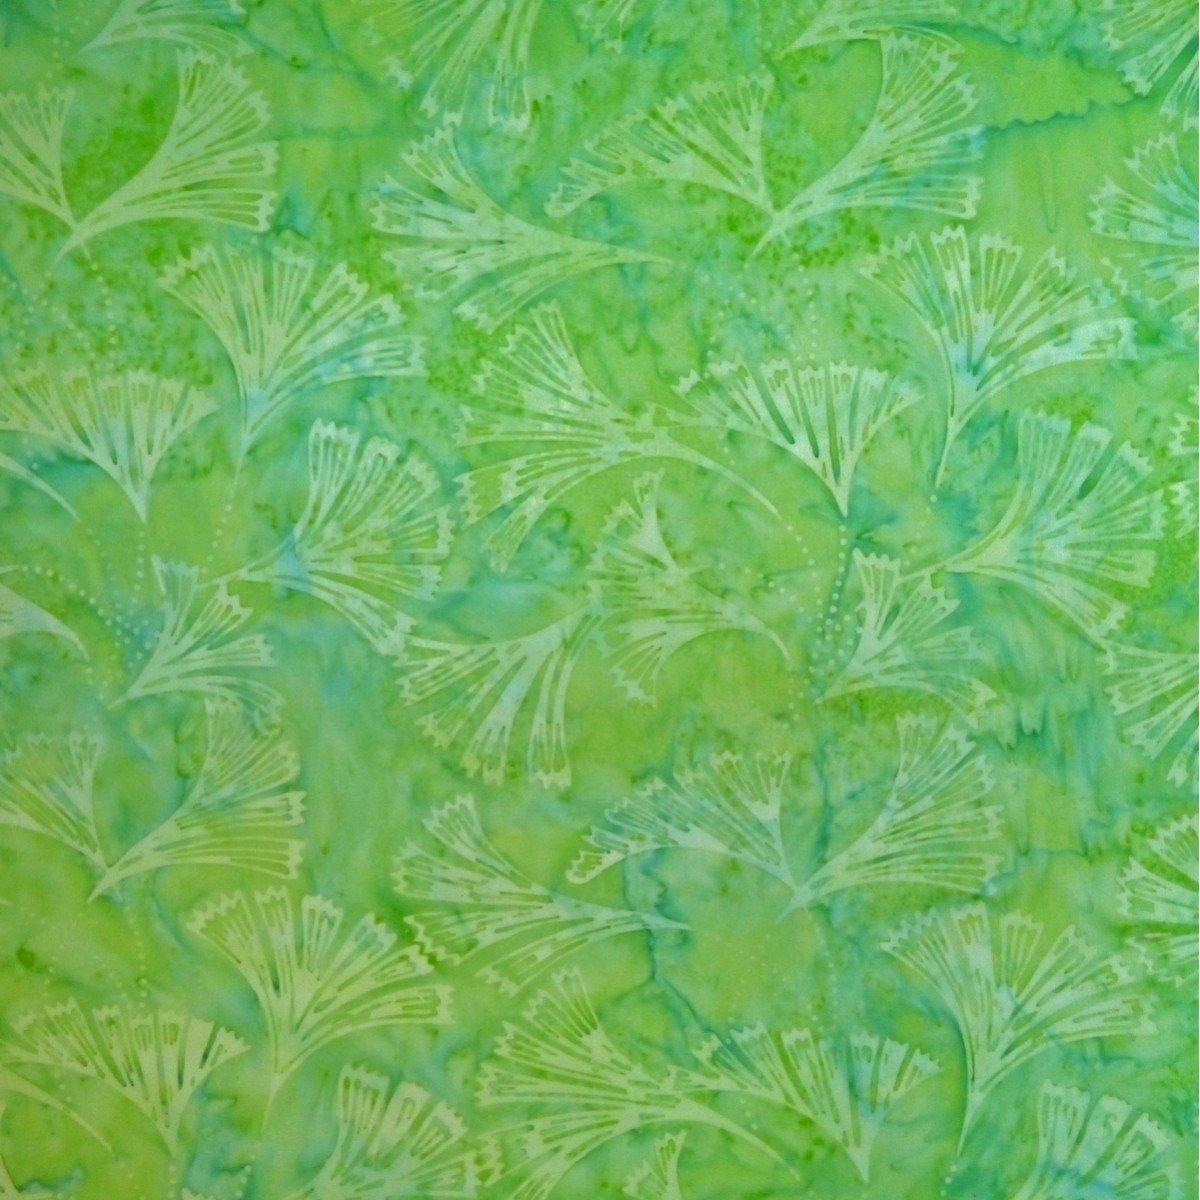 Batik by Mirah Mocktail MT-1-1519 Agar Agar